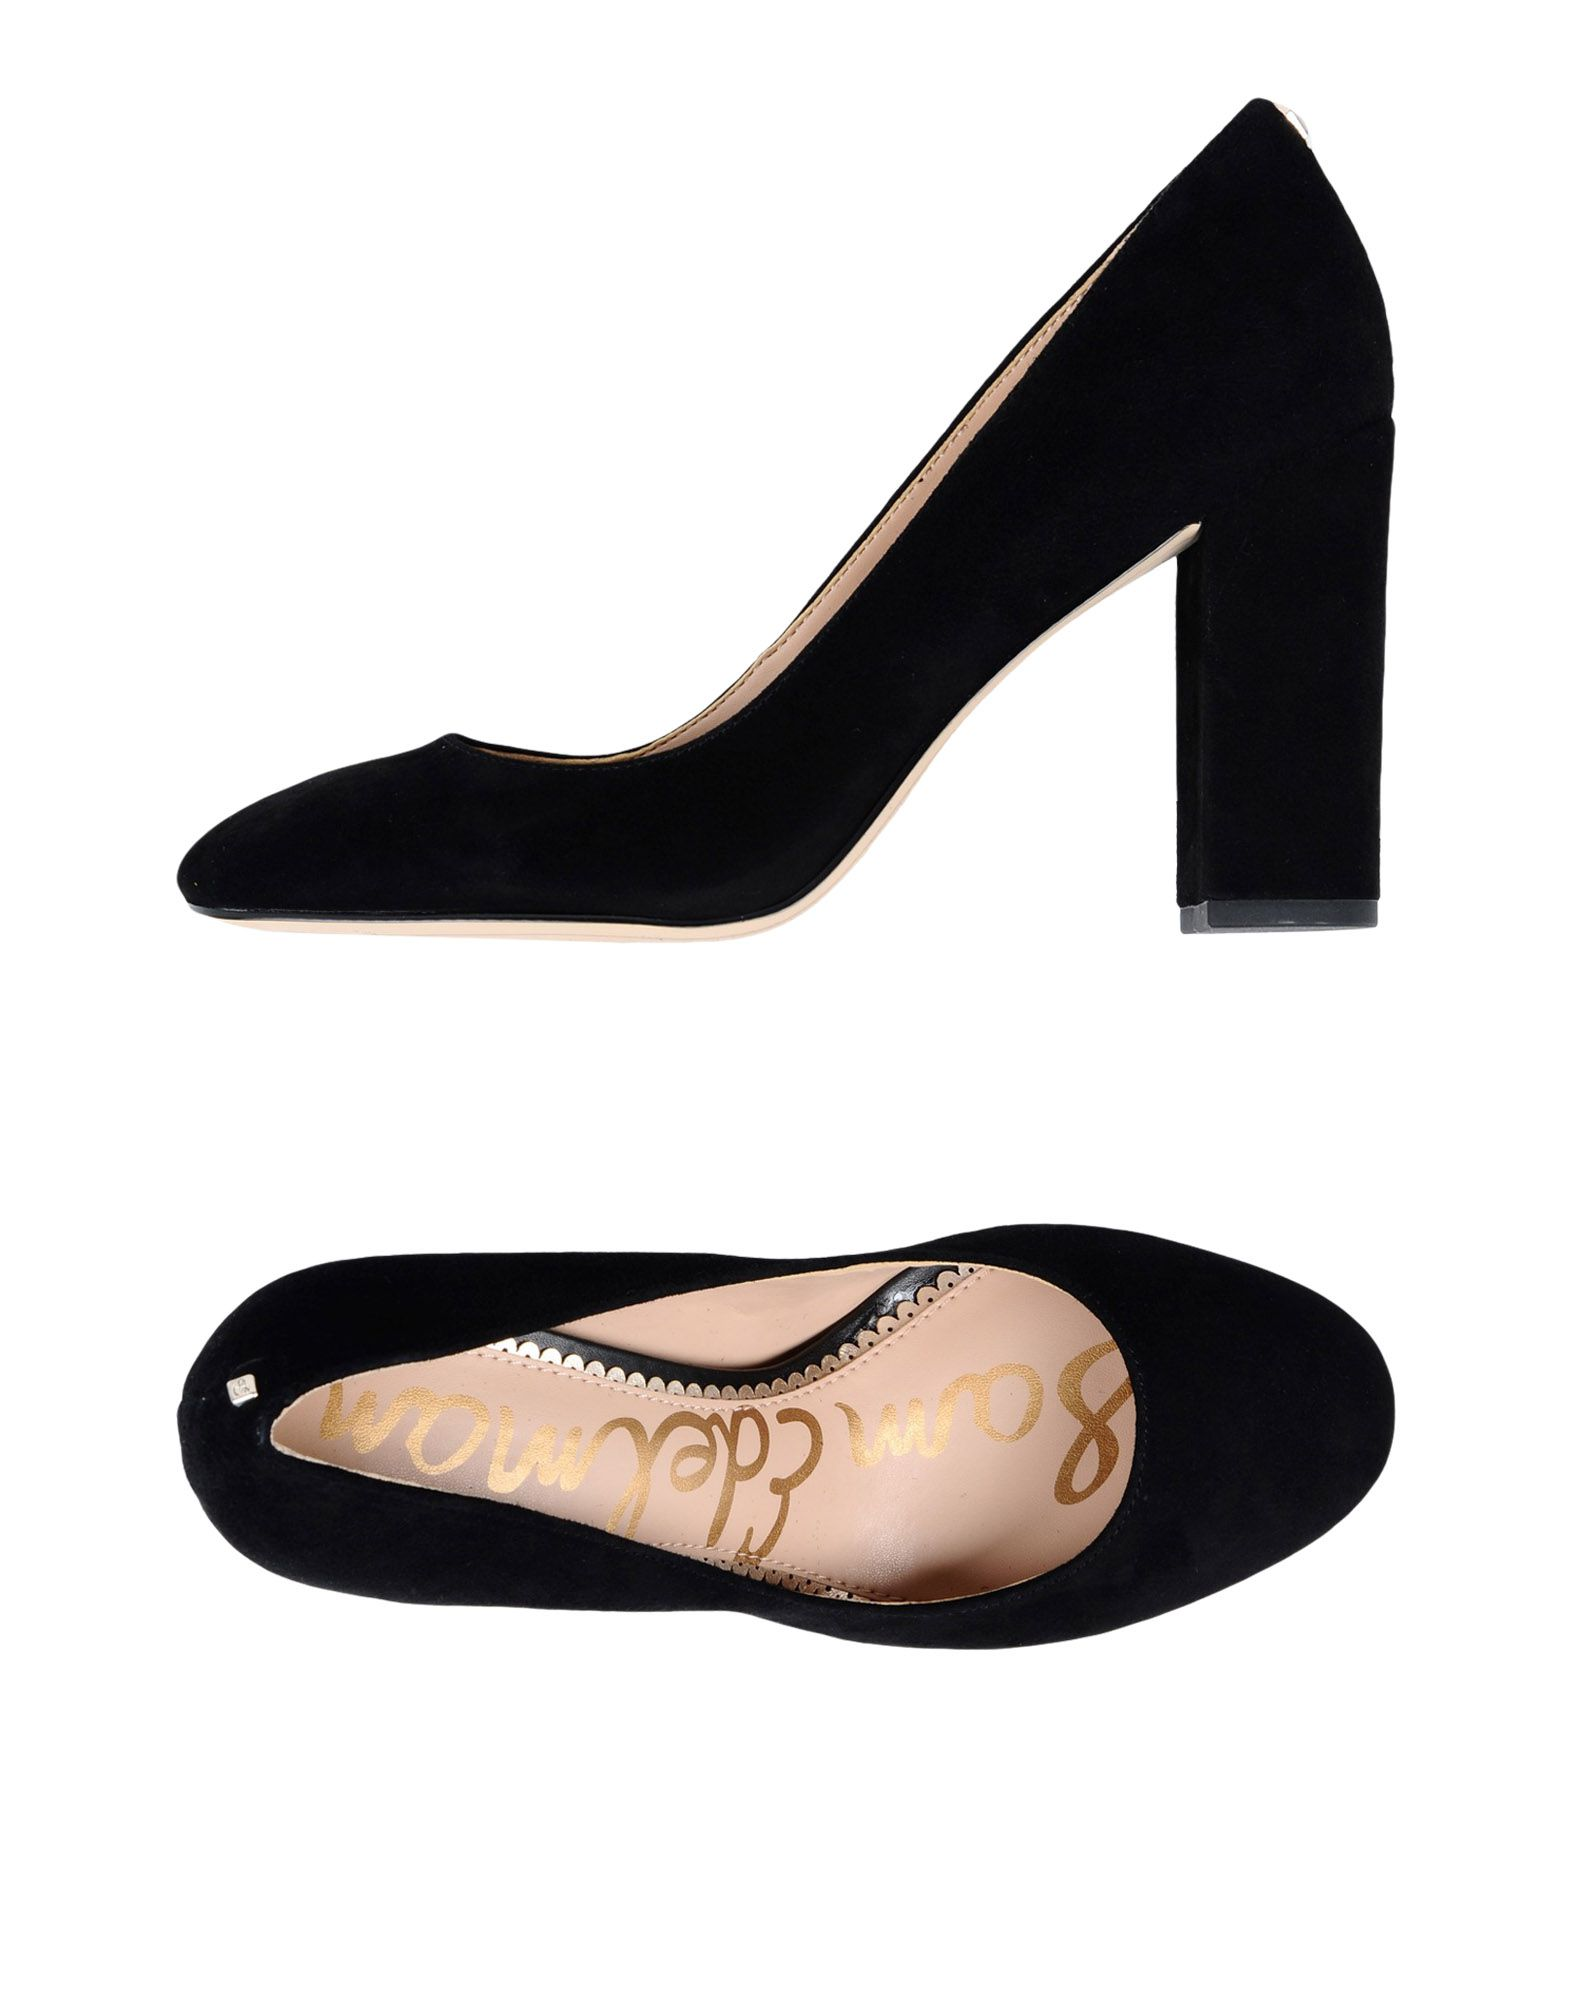 Sandali Ras Donna e - 11462985BM Nuove offerte e Donna scarpe comode d73e9c